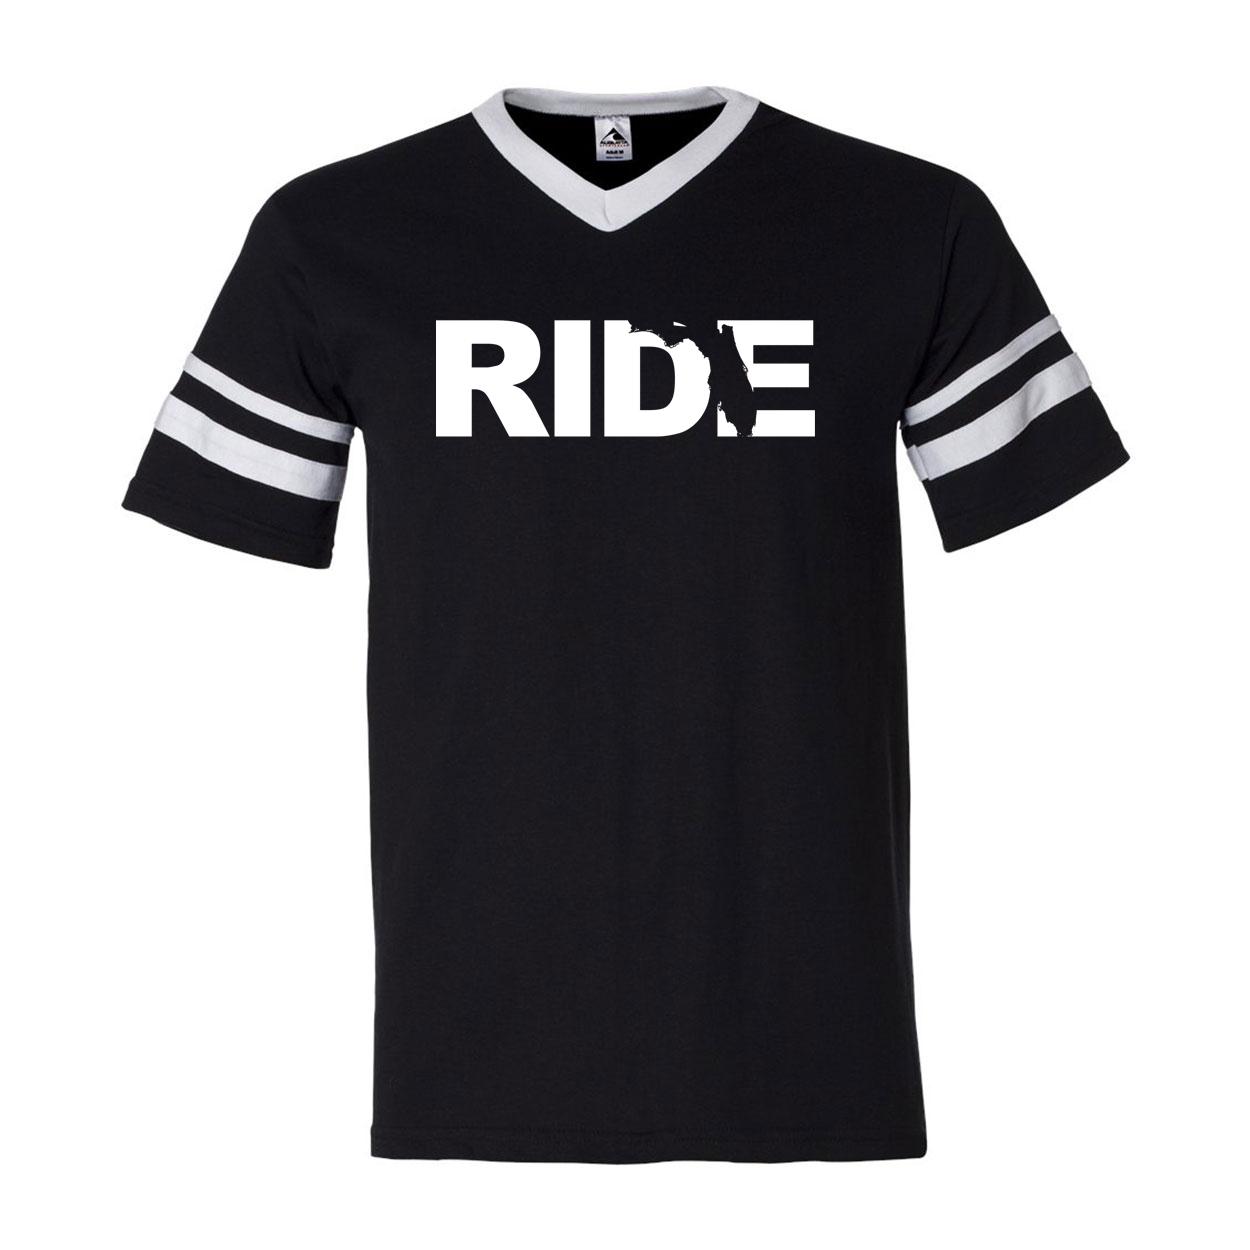 Ride Florida Classic Premium Striped Jersey T-Shirt Black/White (White Logo)